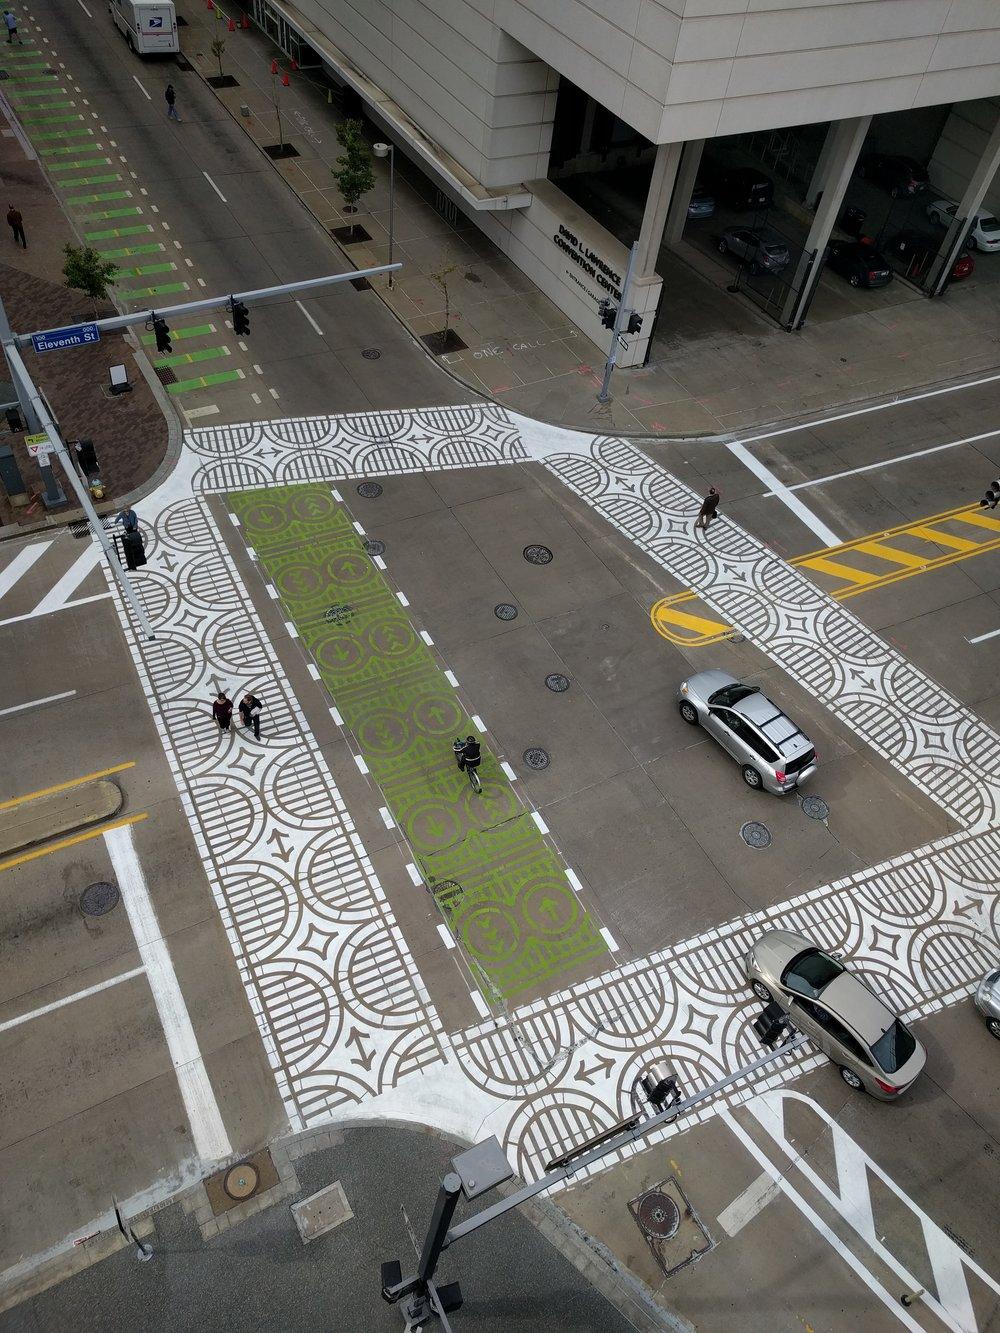 penn 11th traffic calming graphic crosswalks envision downtown